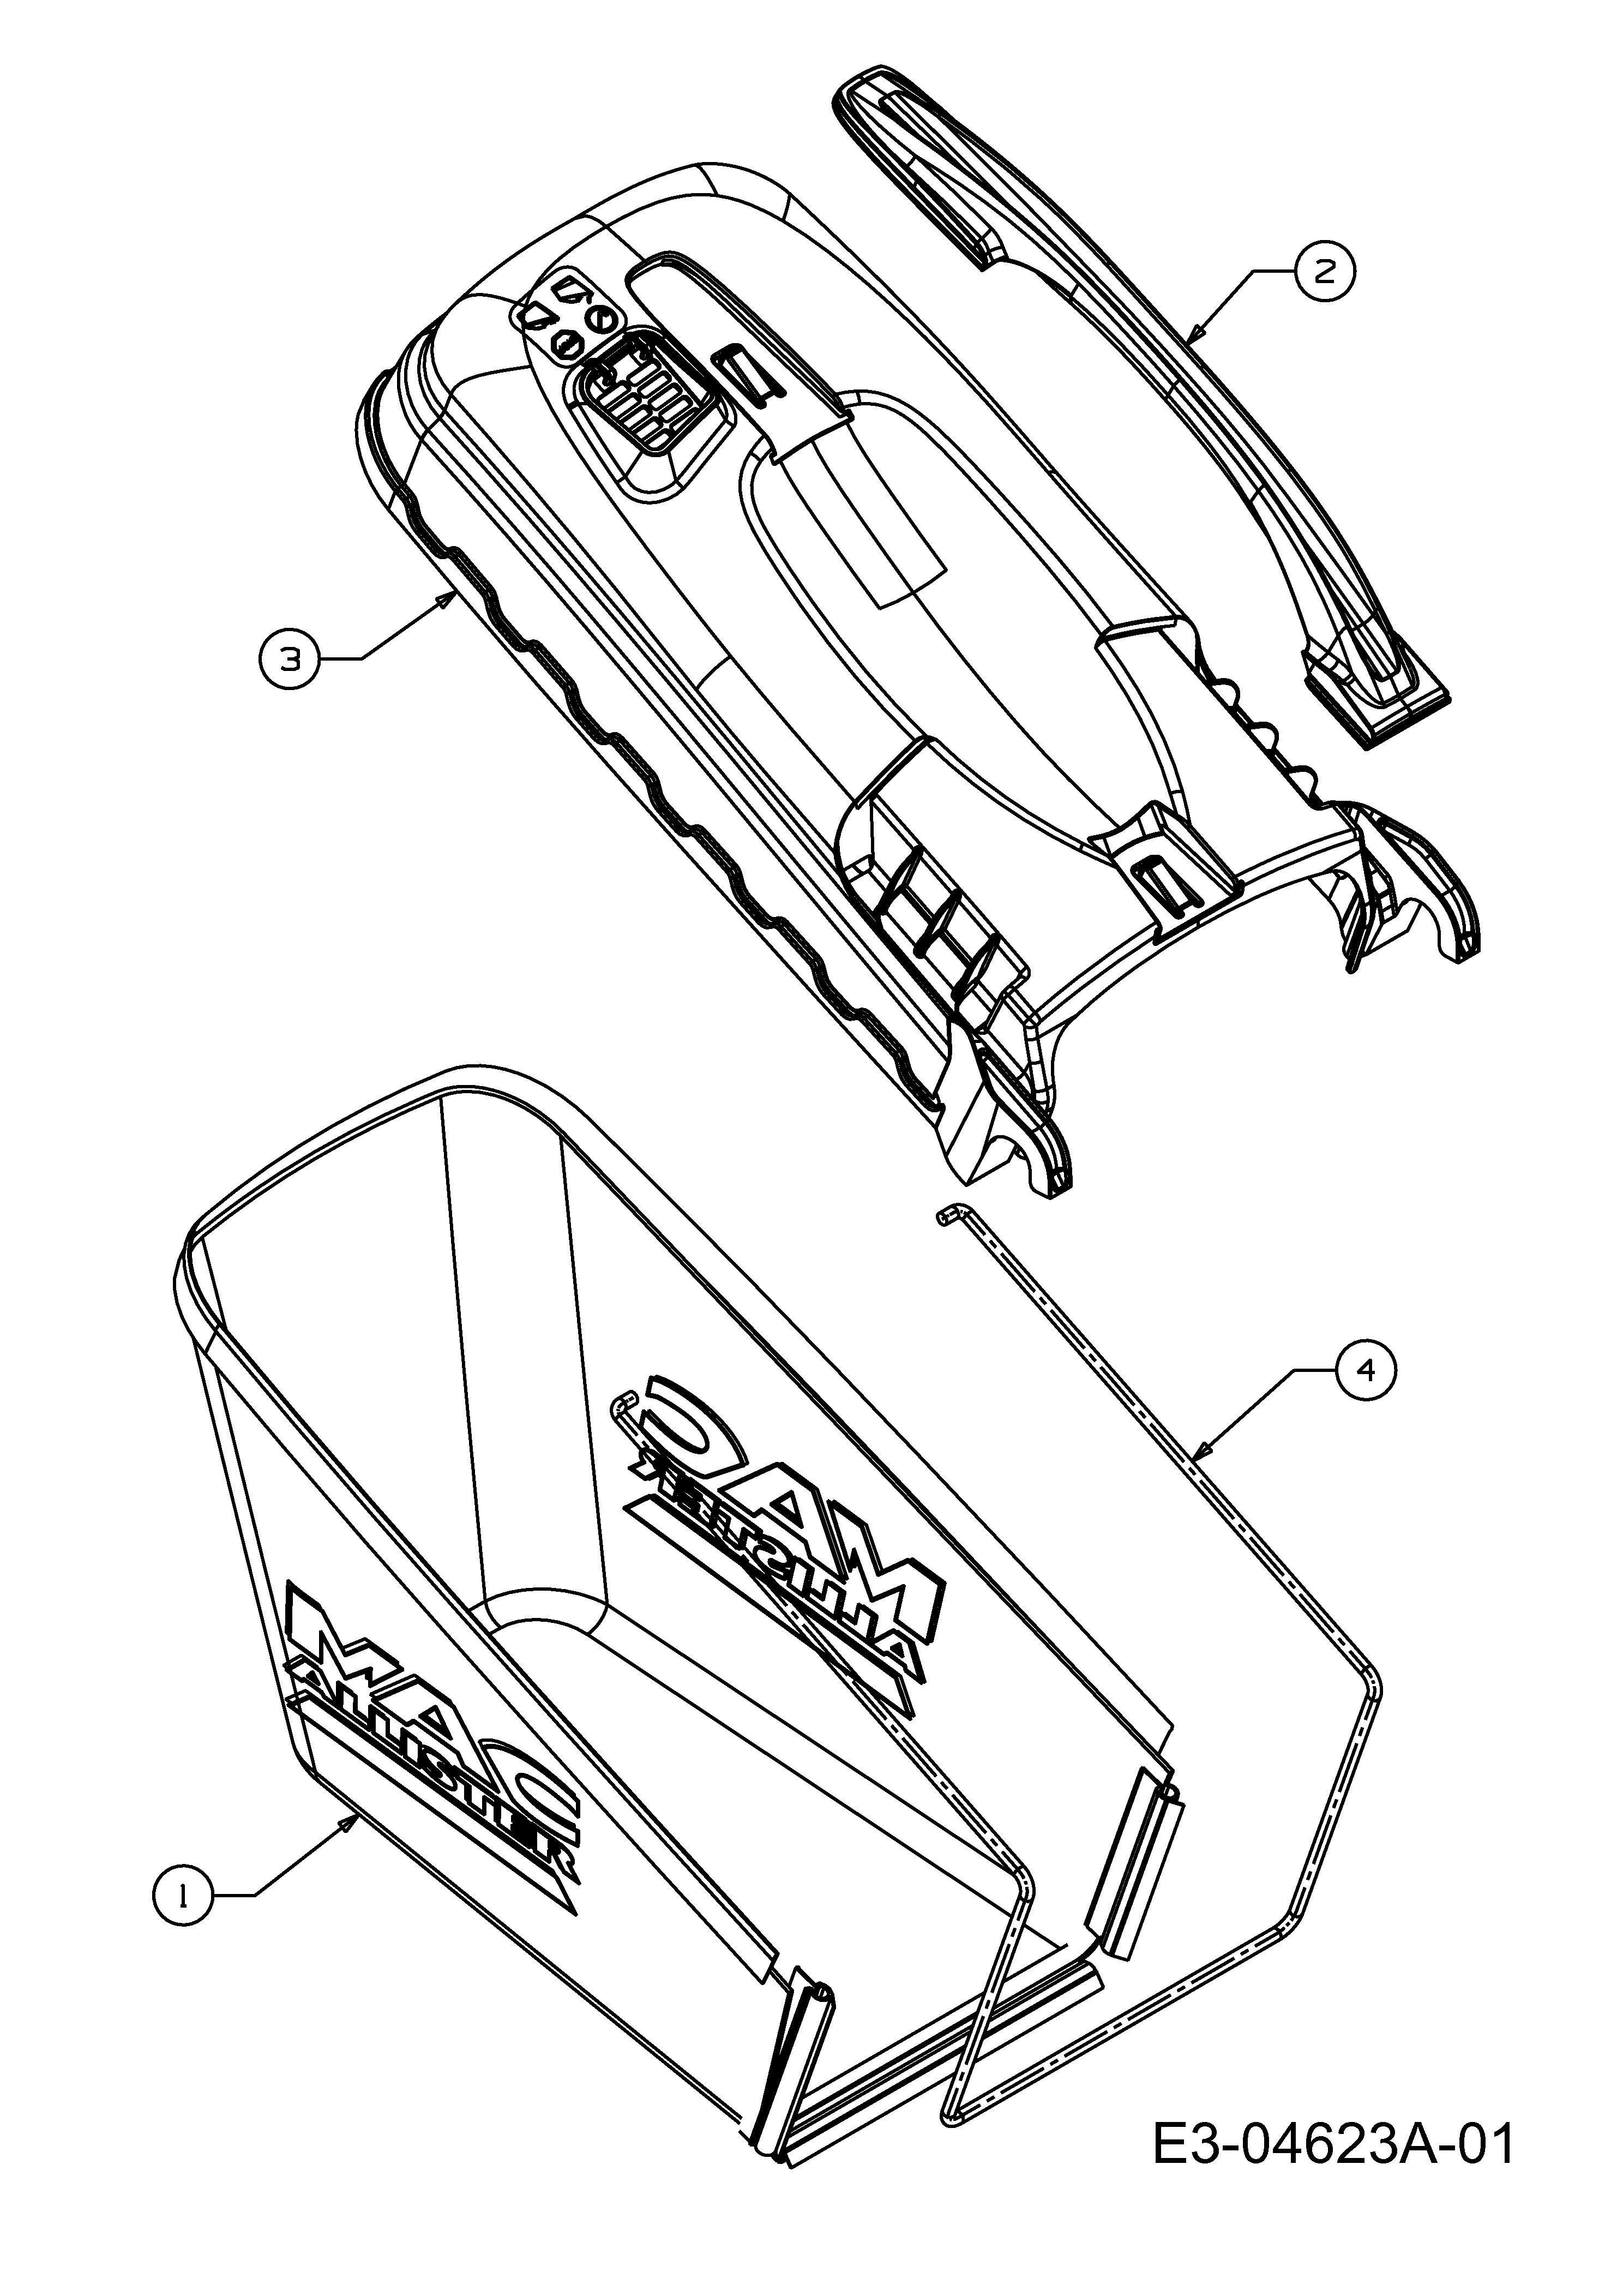 Grasfangsack, 12AI867D668 (2009), 6053 BHW, Motormäher mit